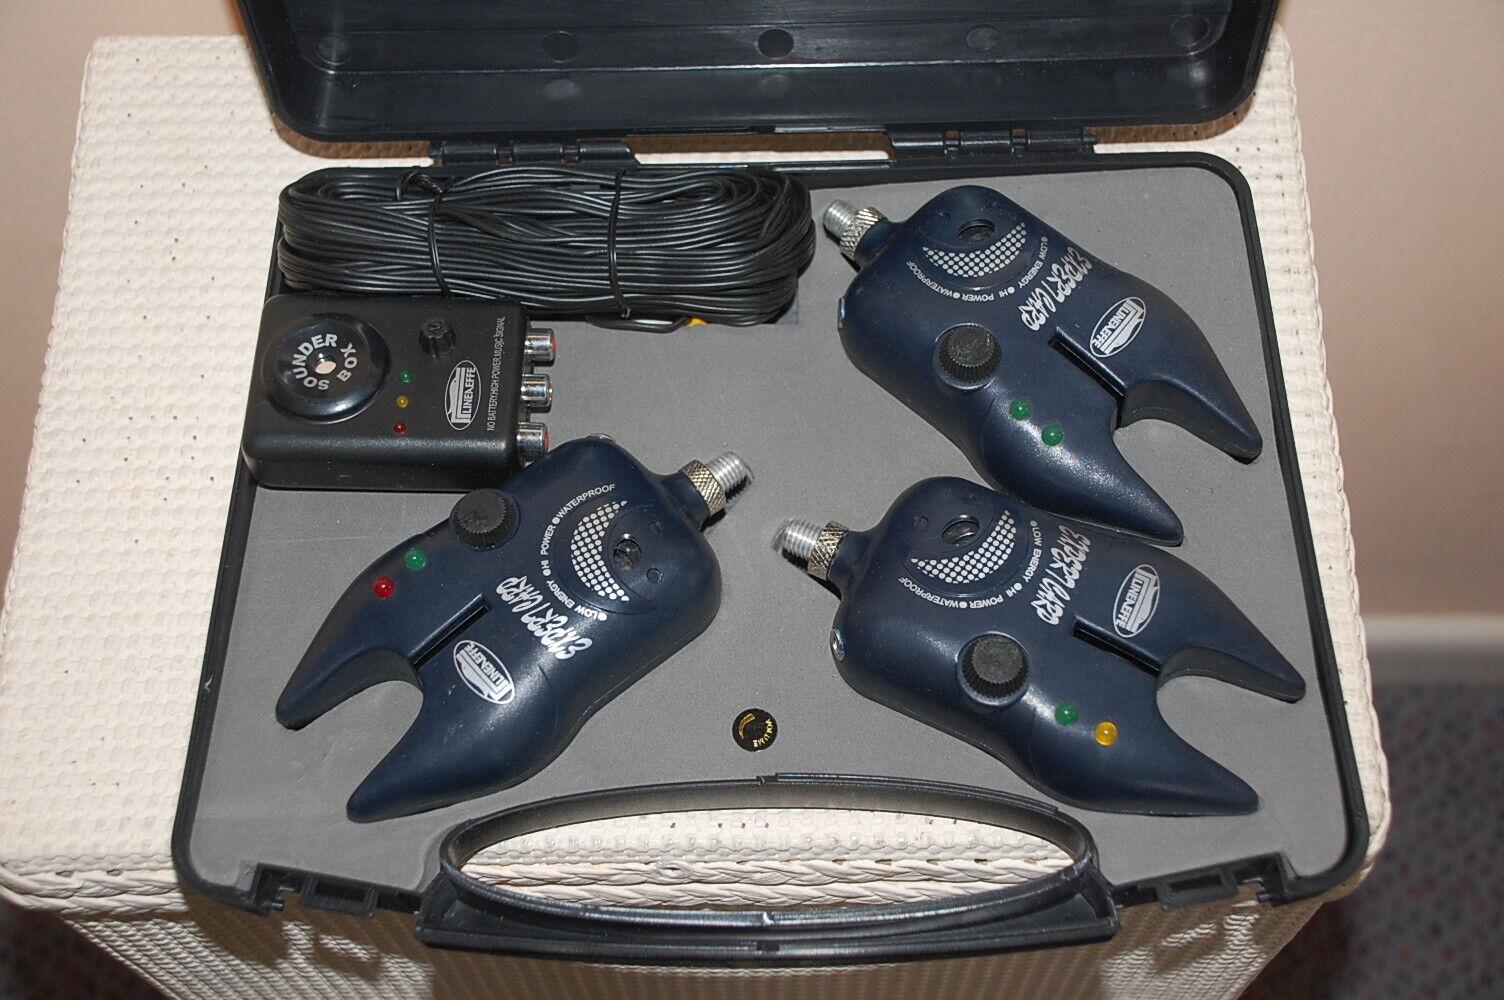 LINEAEFFE Expert autop Bite Alarm Set di 3 con Ricevitore Caso Tackle